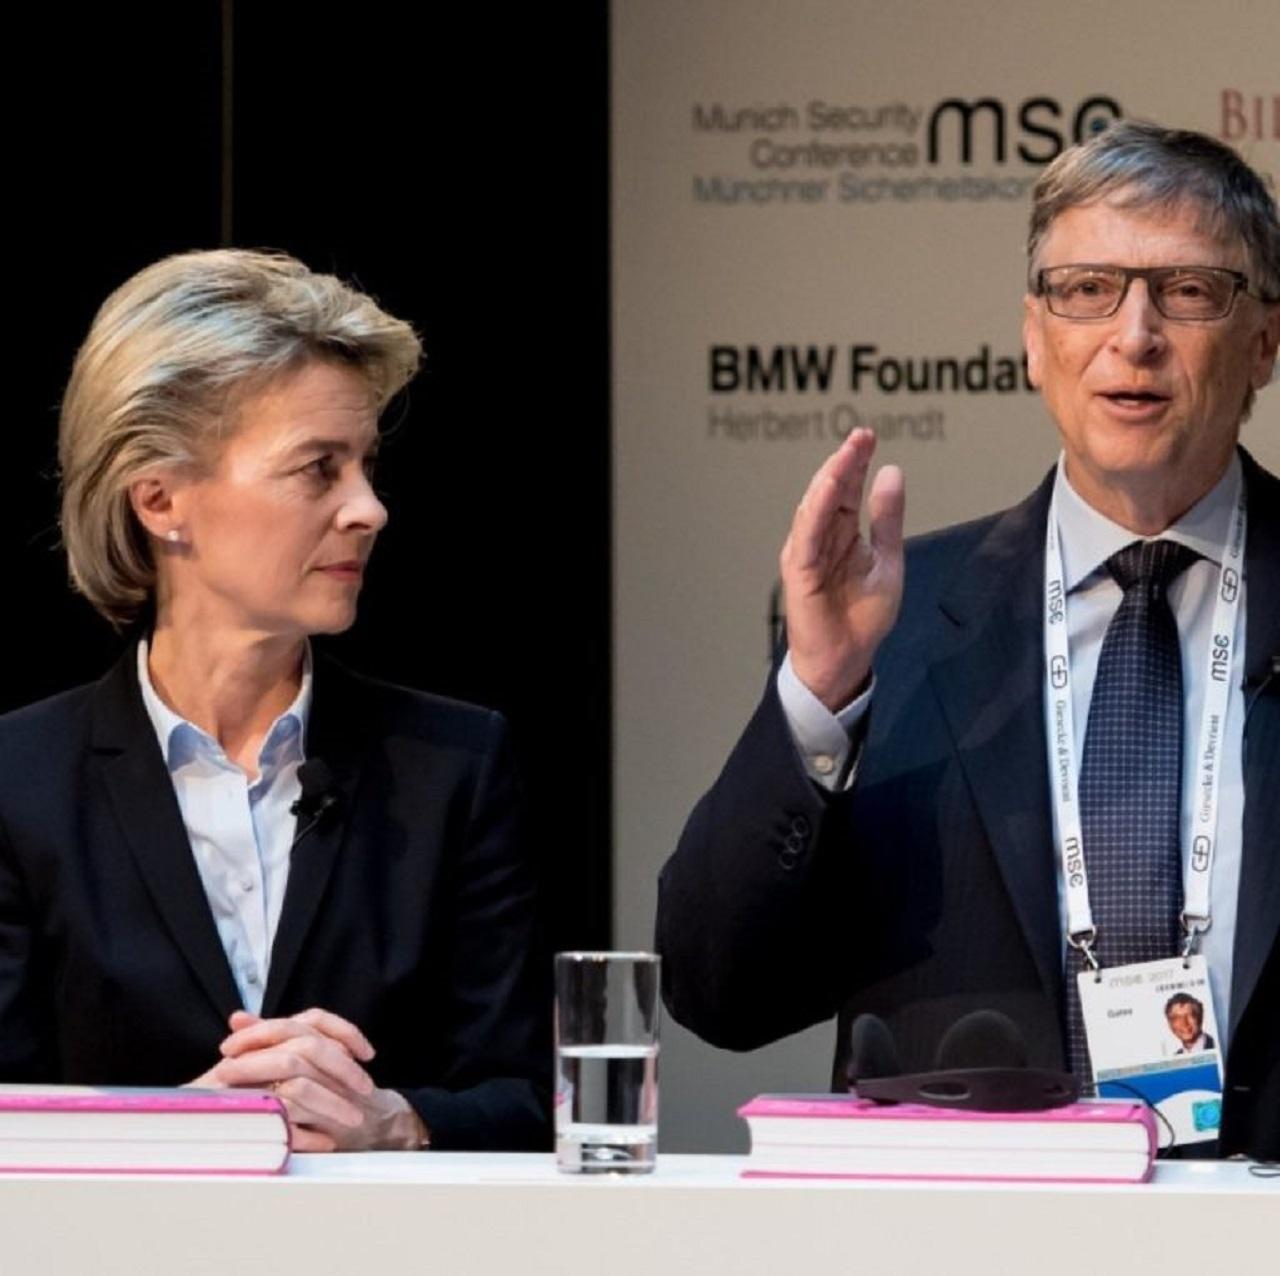 Ursula von der Leyen ako ministerka obrany Nemecka a Bill Gates